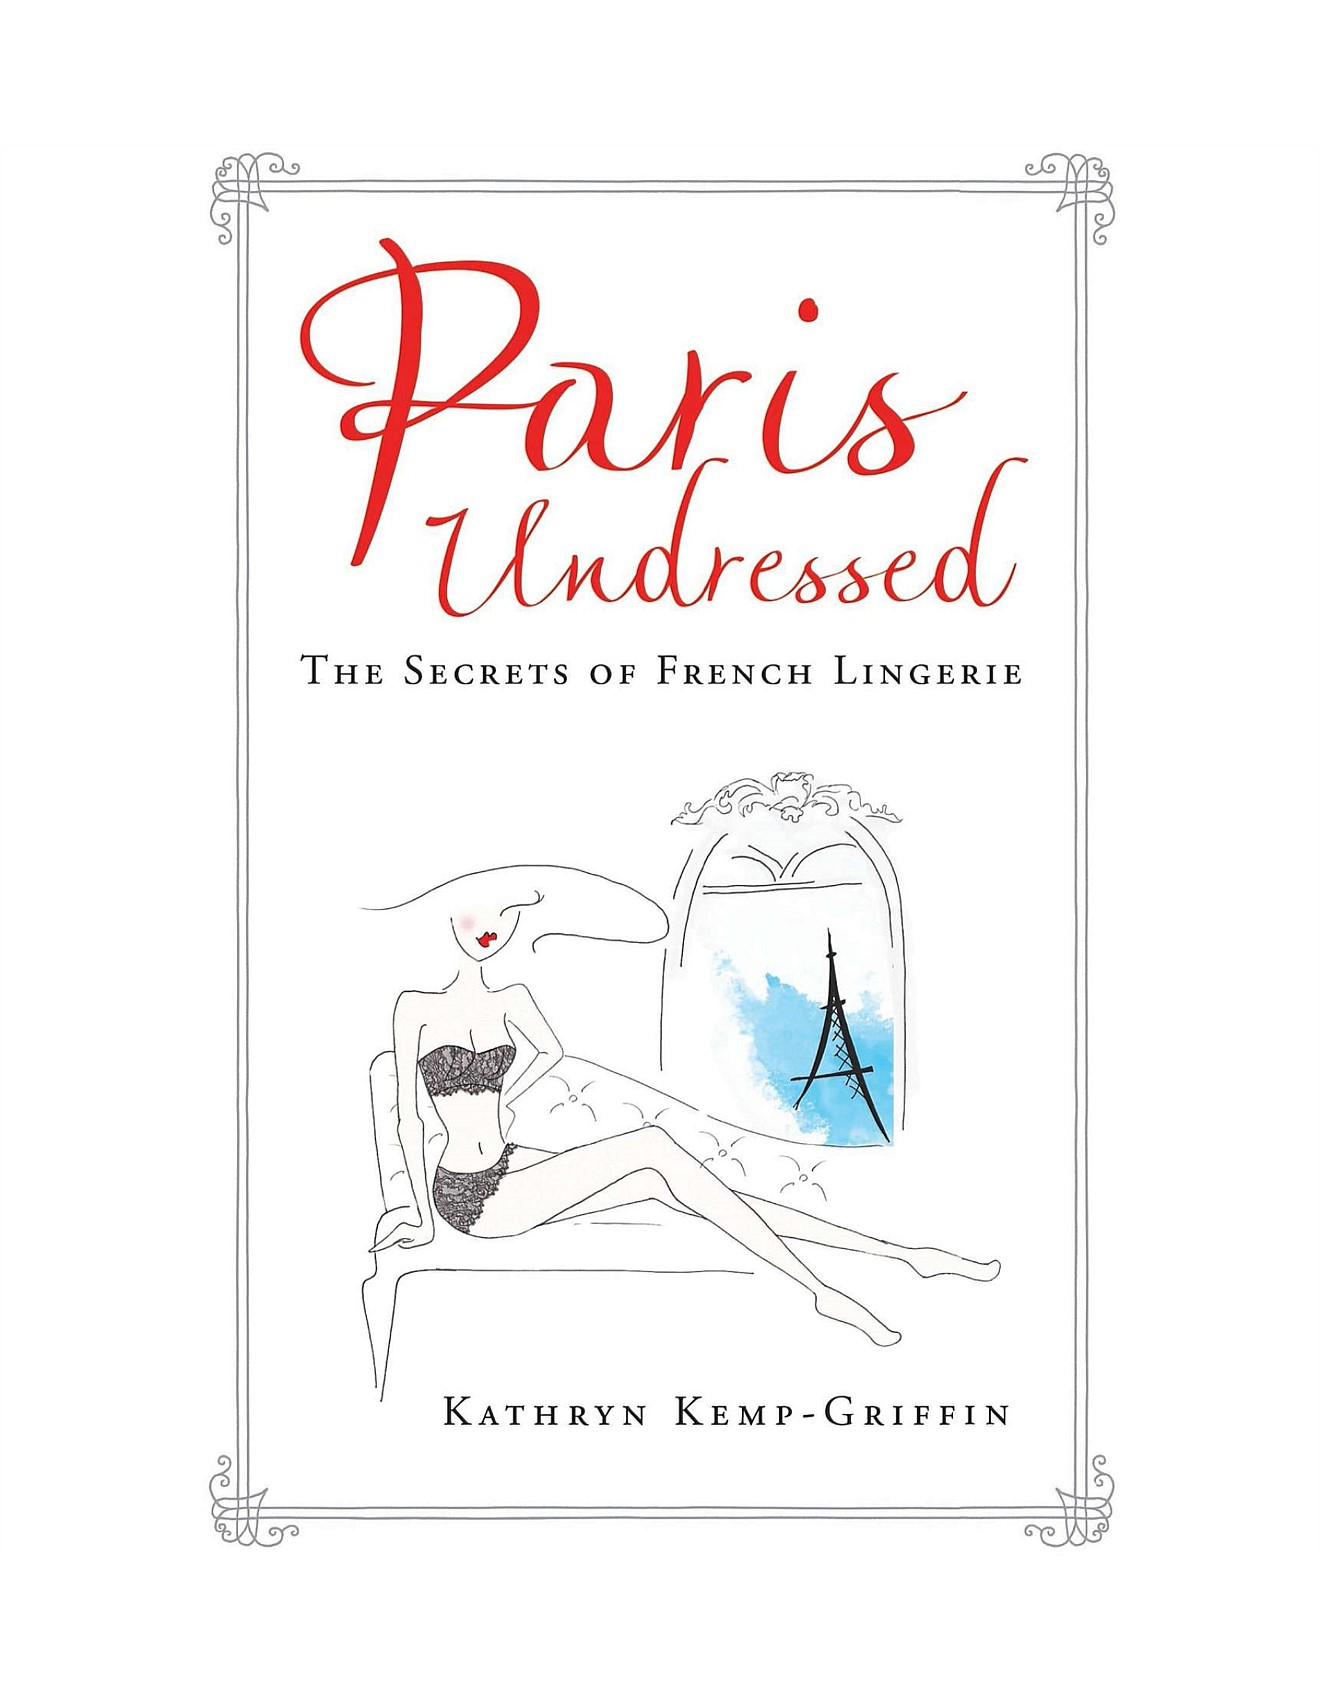 paris undressed the secrets of french lingerie